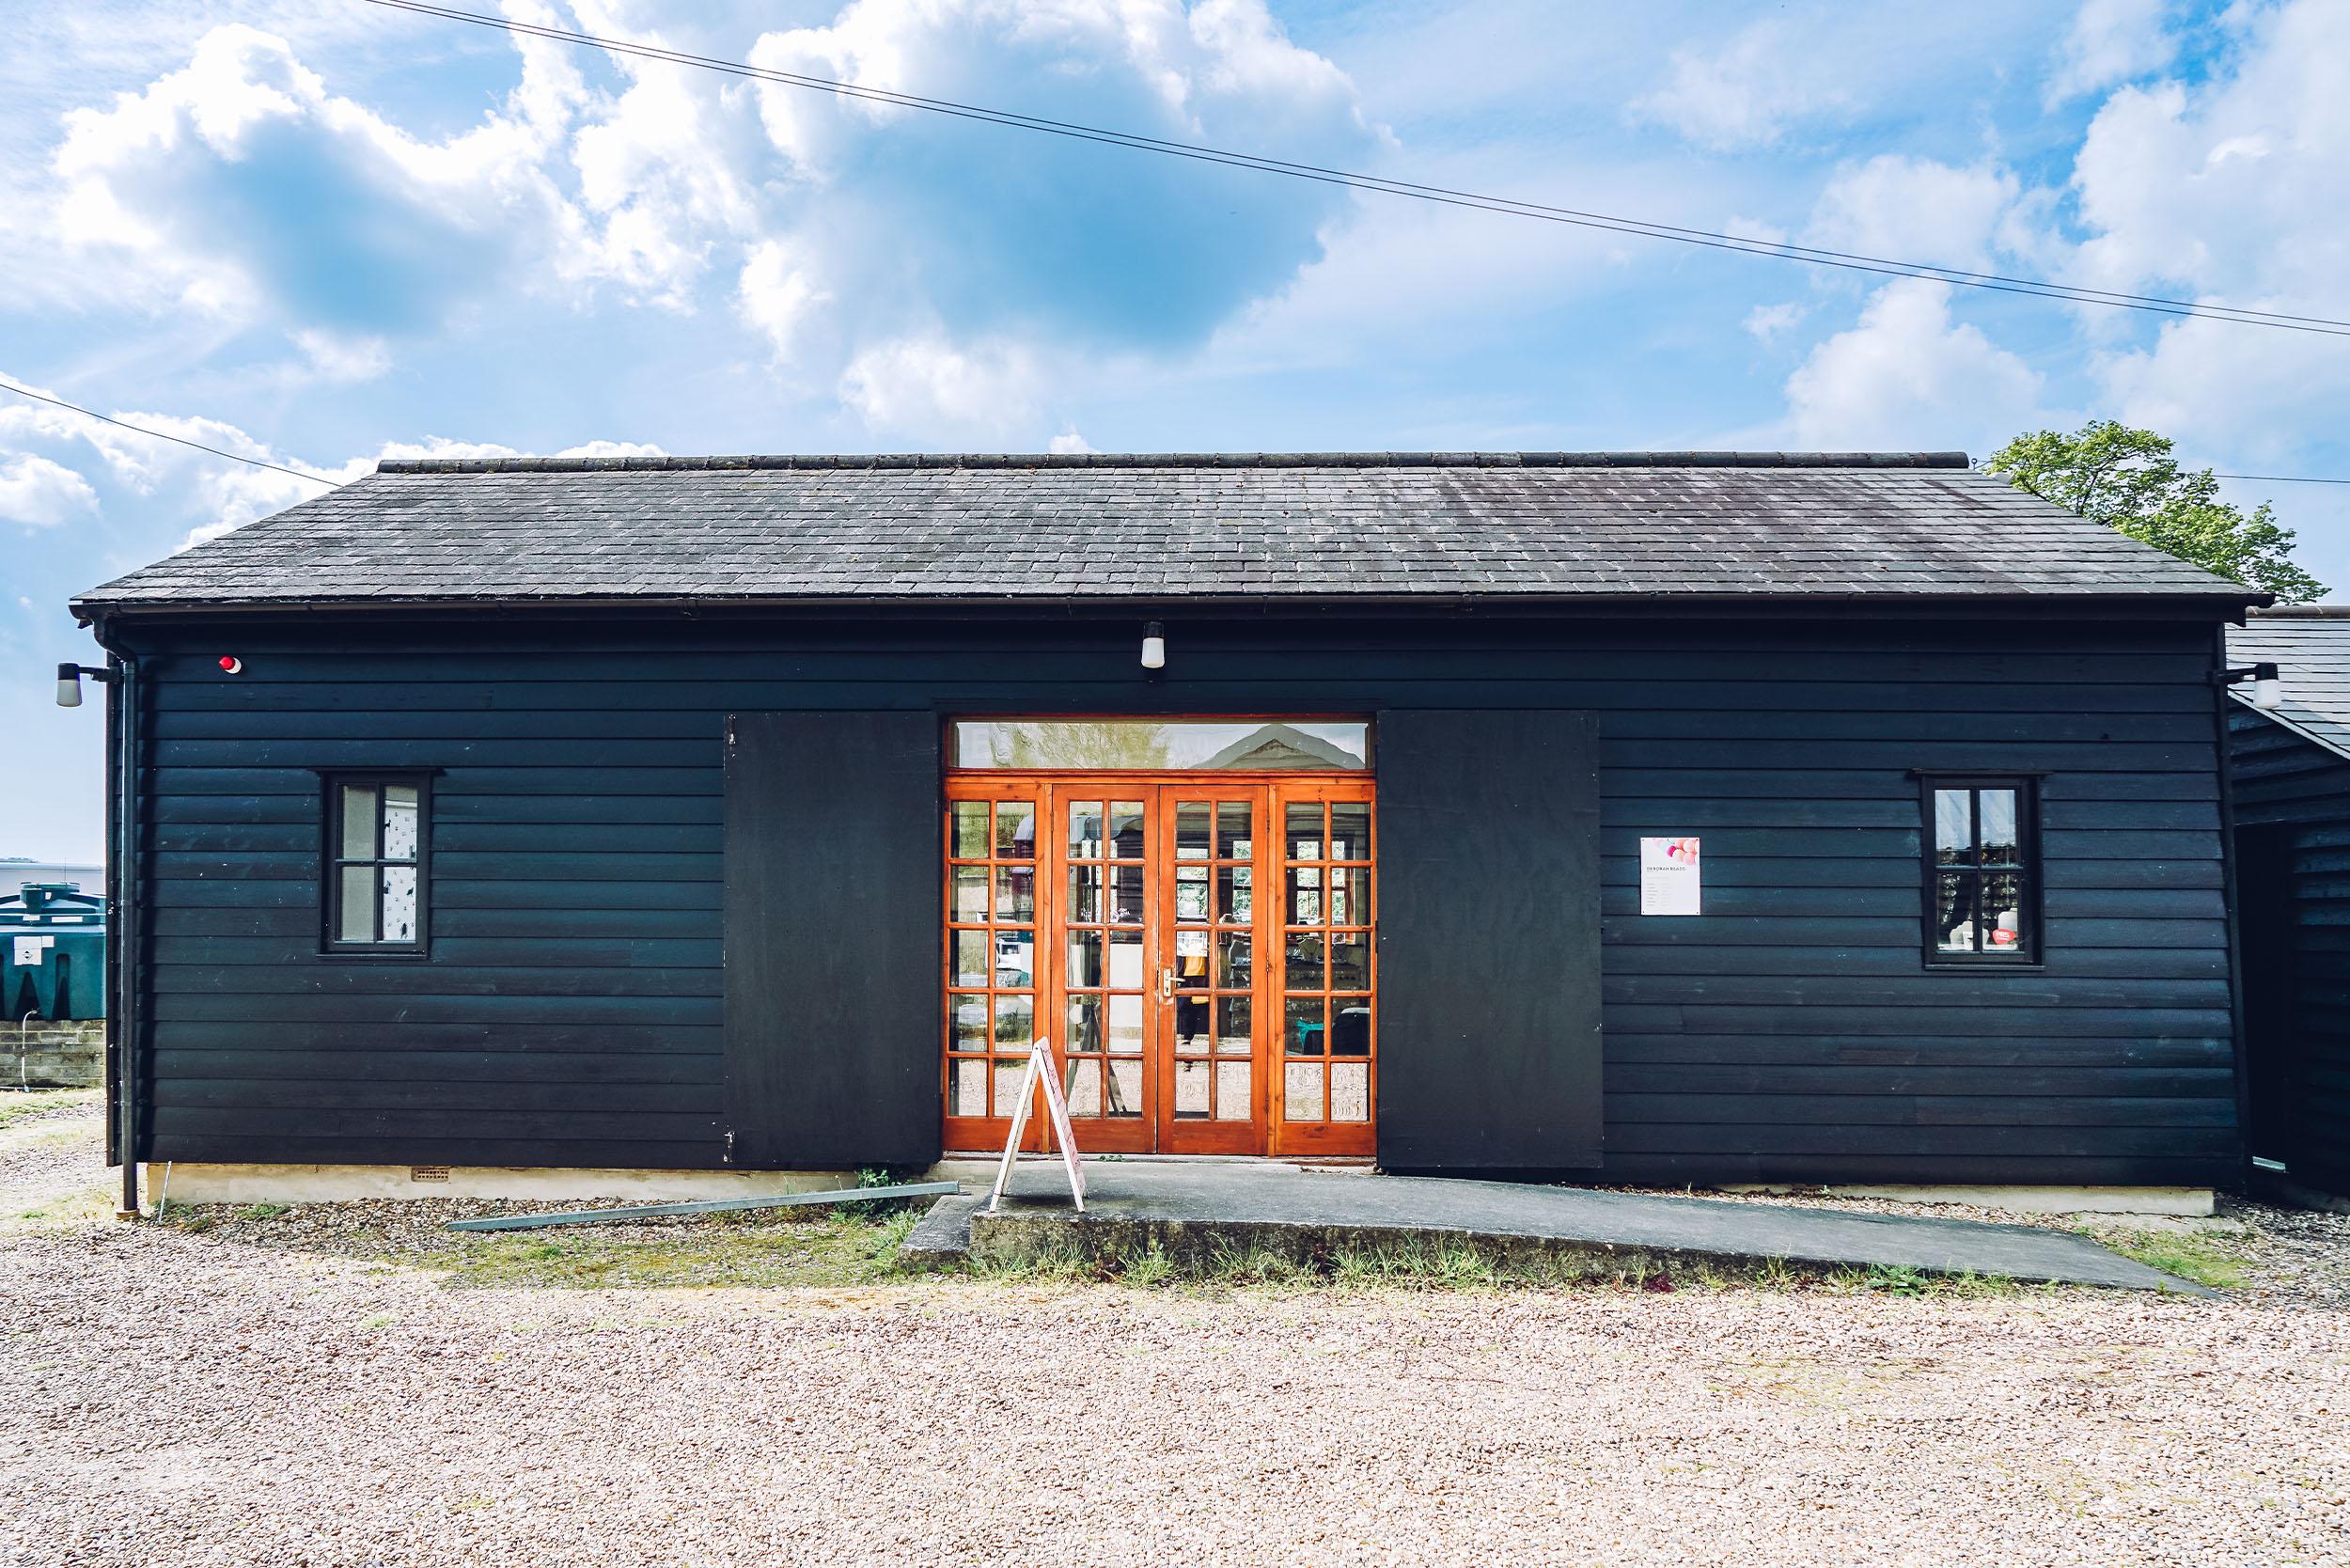 Deborah Beads - Colchester - Bead Shop.jpg